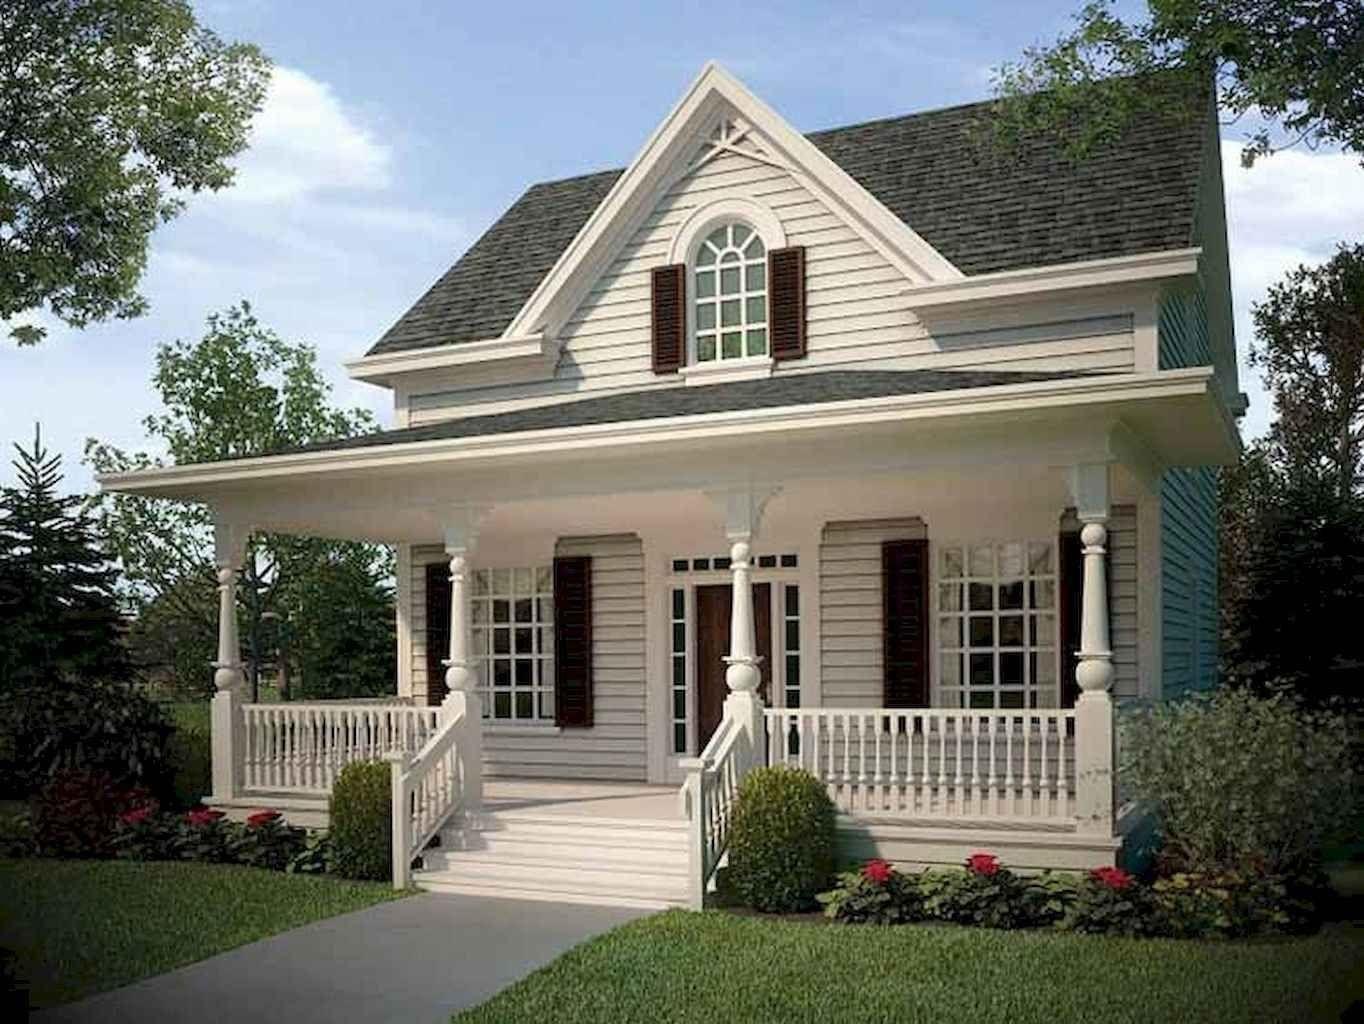 130 Stunning Farmhouse Exterior Design Ideas In 2020 House Plans Farmhouse Country Style House Plans Cottage House Plans